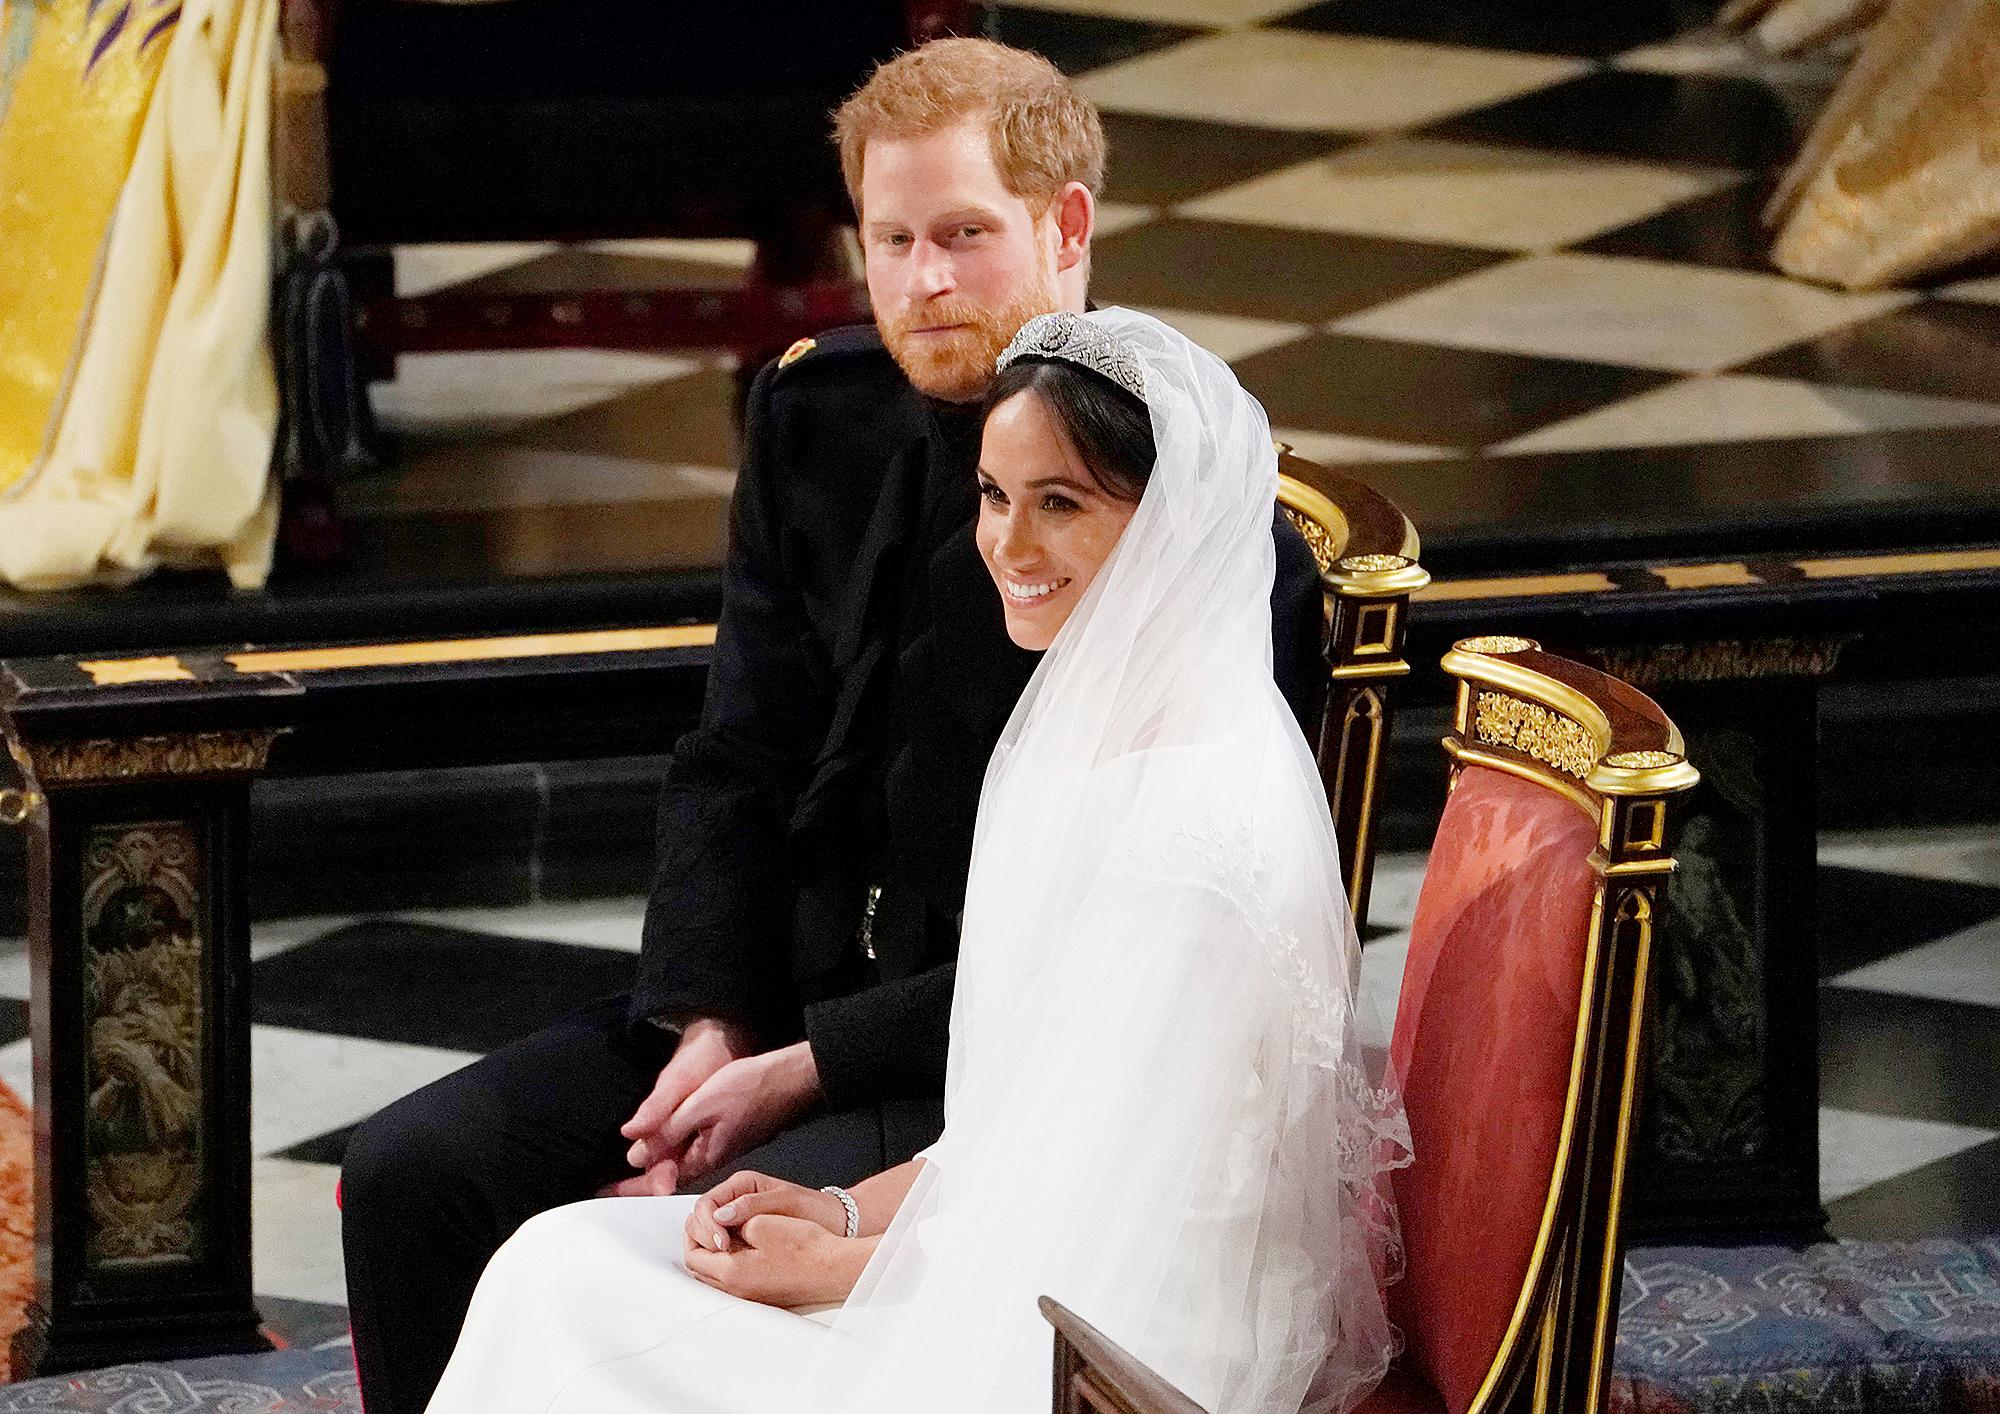 Prince Harry Meghan Markle Royal Wedding Sermon